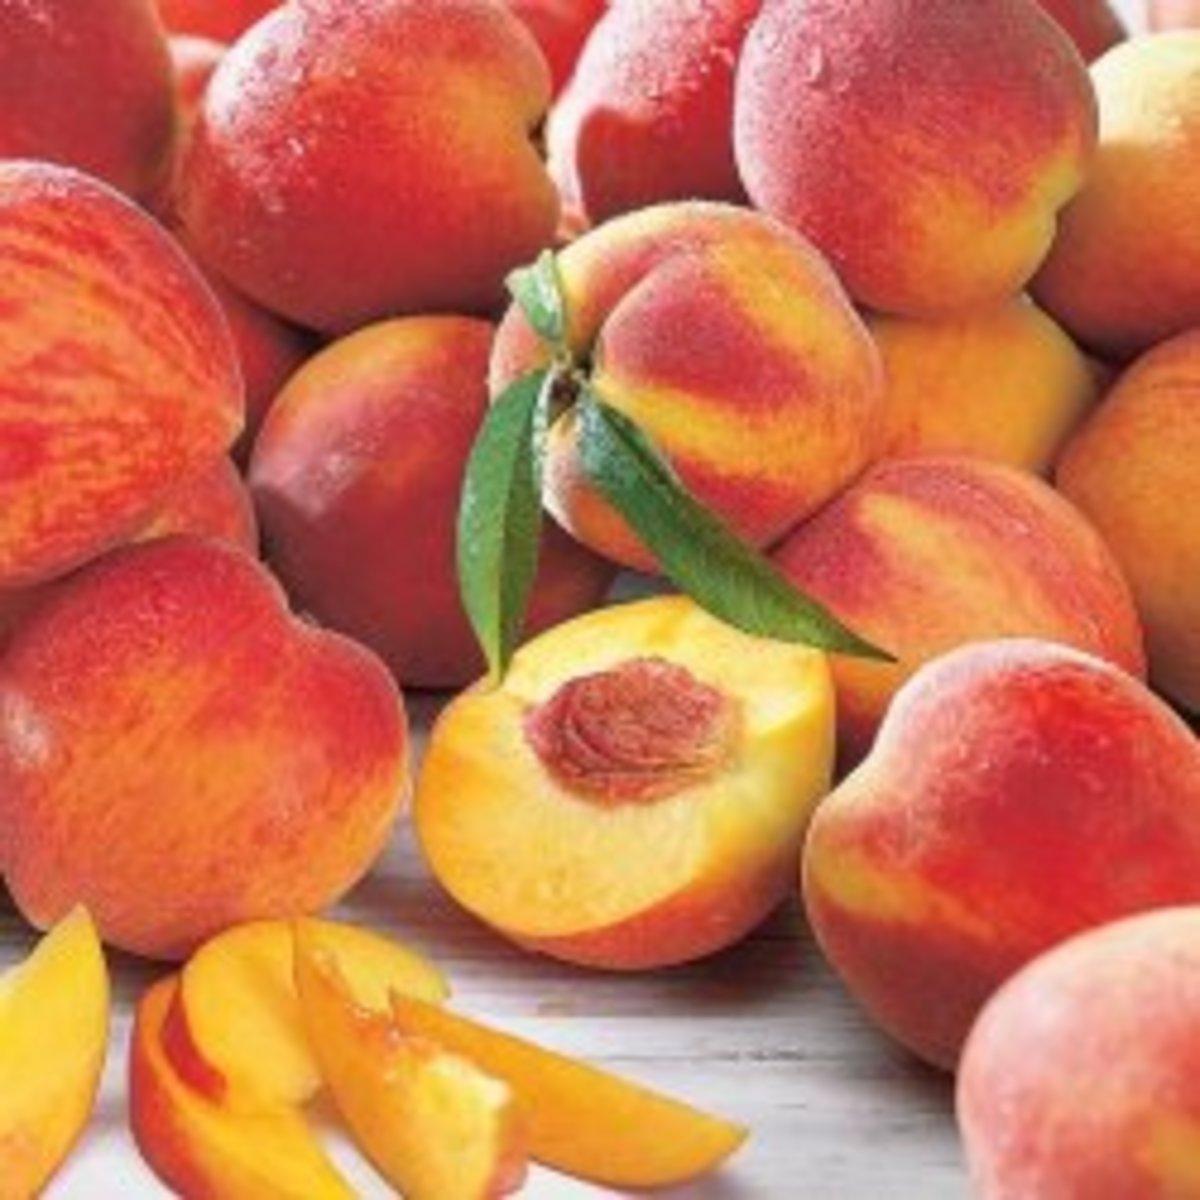 Image credit: http://www.eatlikenoone.com/history-of-peaches-in-georgia.htm